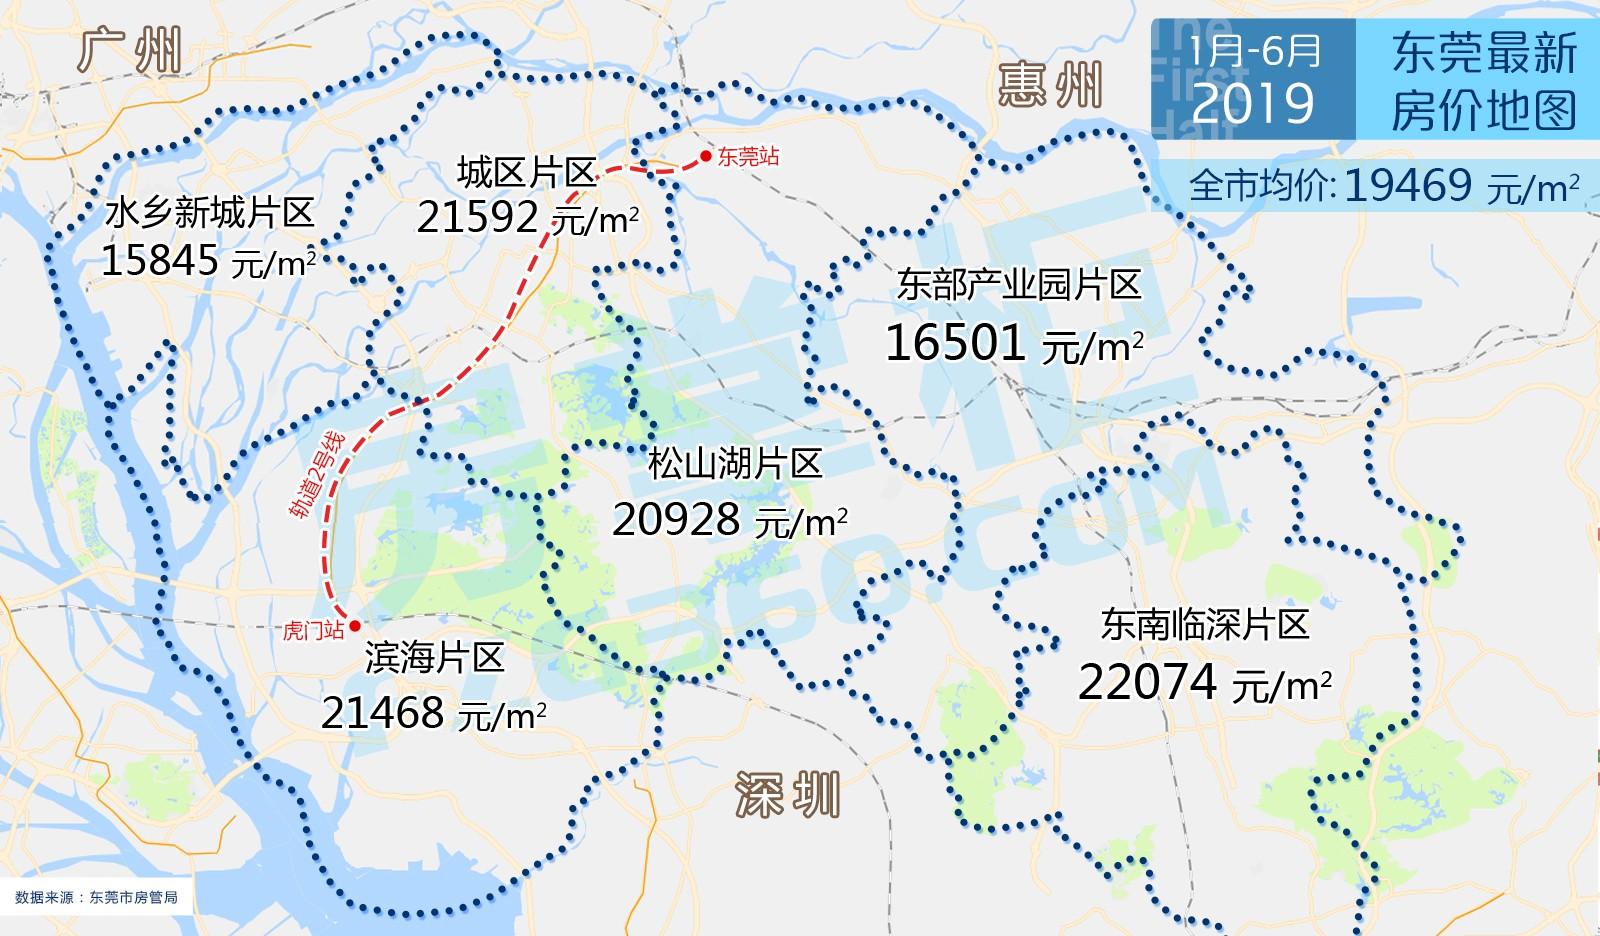 1-6月房价地图.jpg